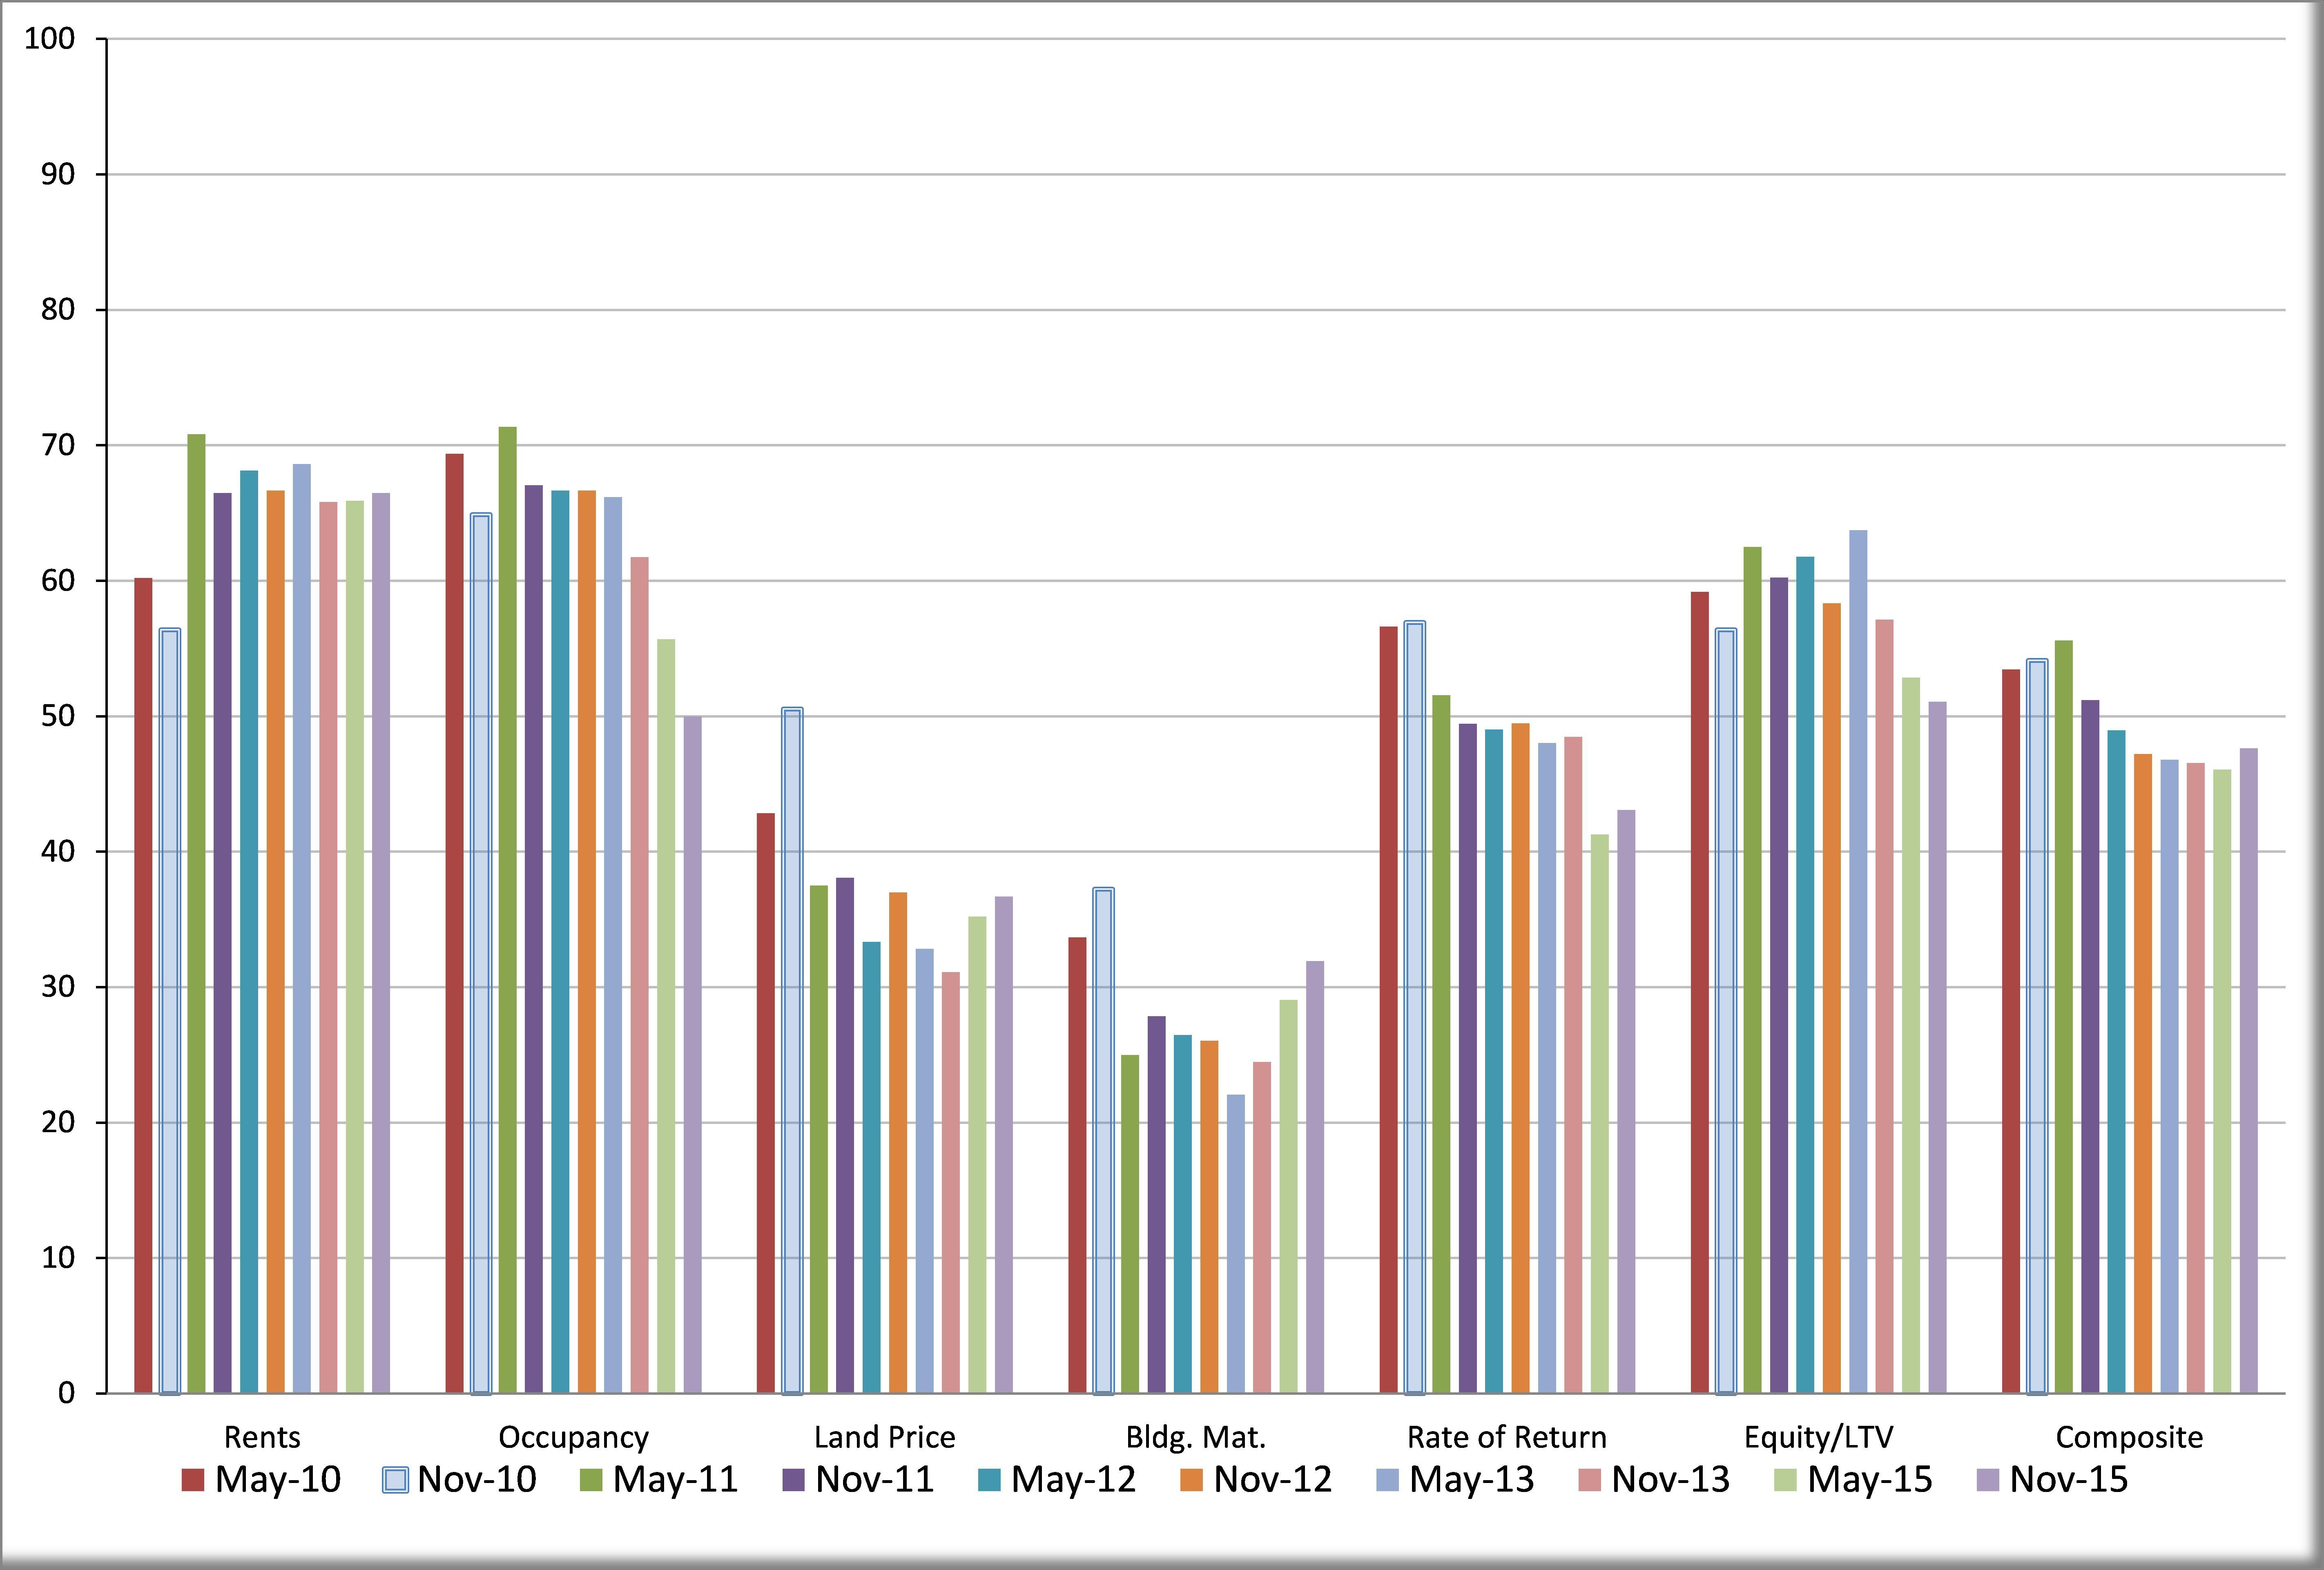 Comm R E Survy Dec 15 Chart